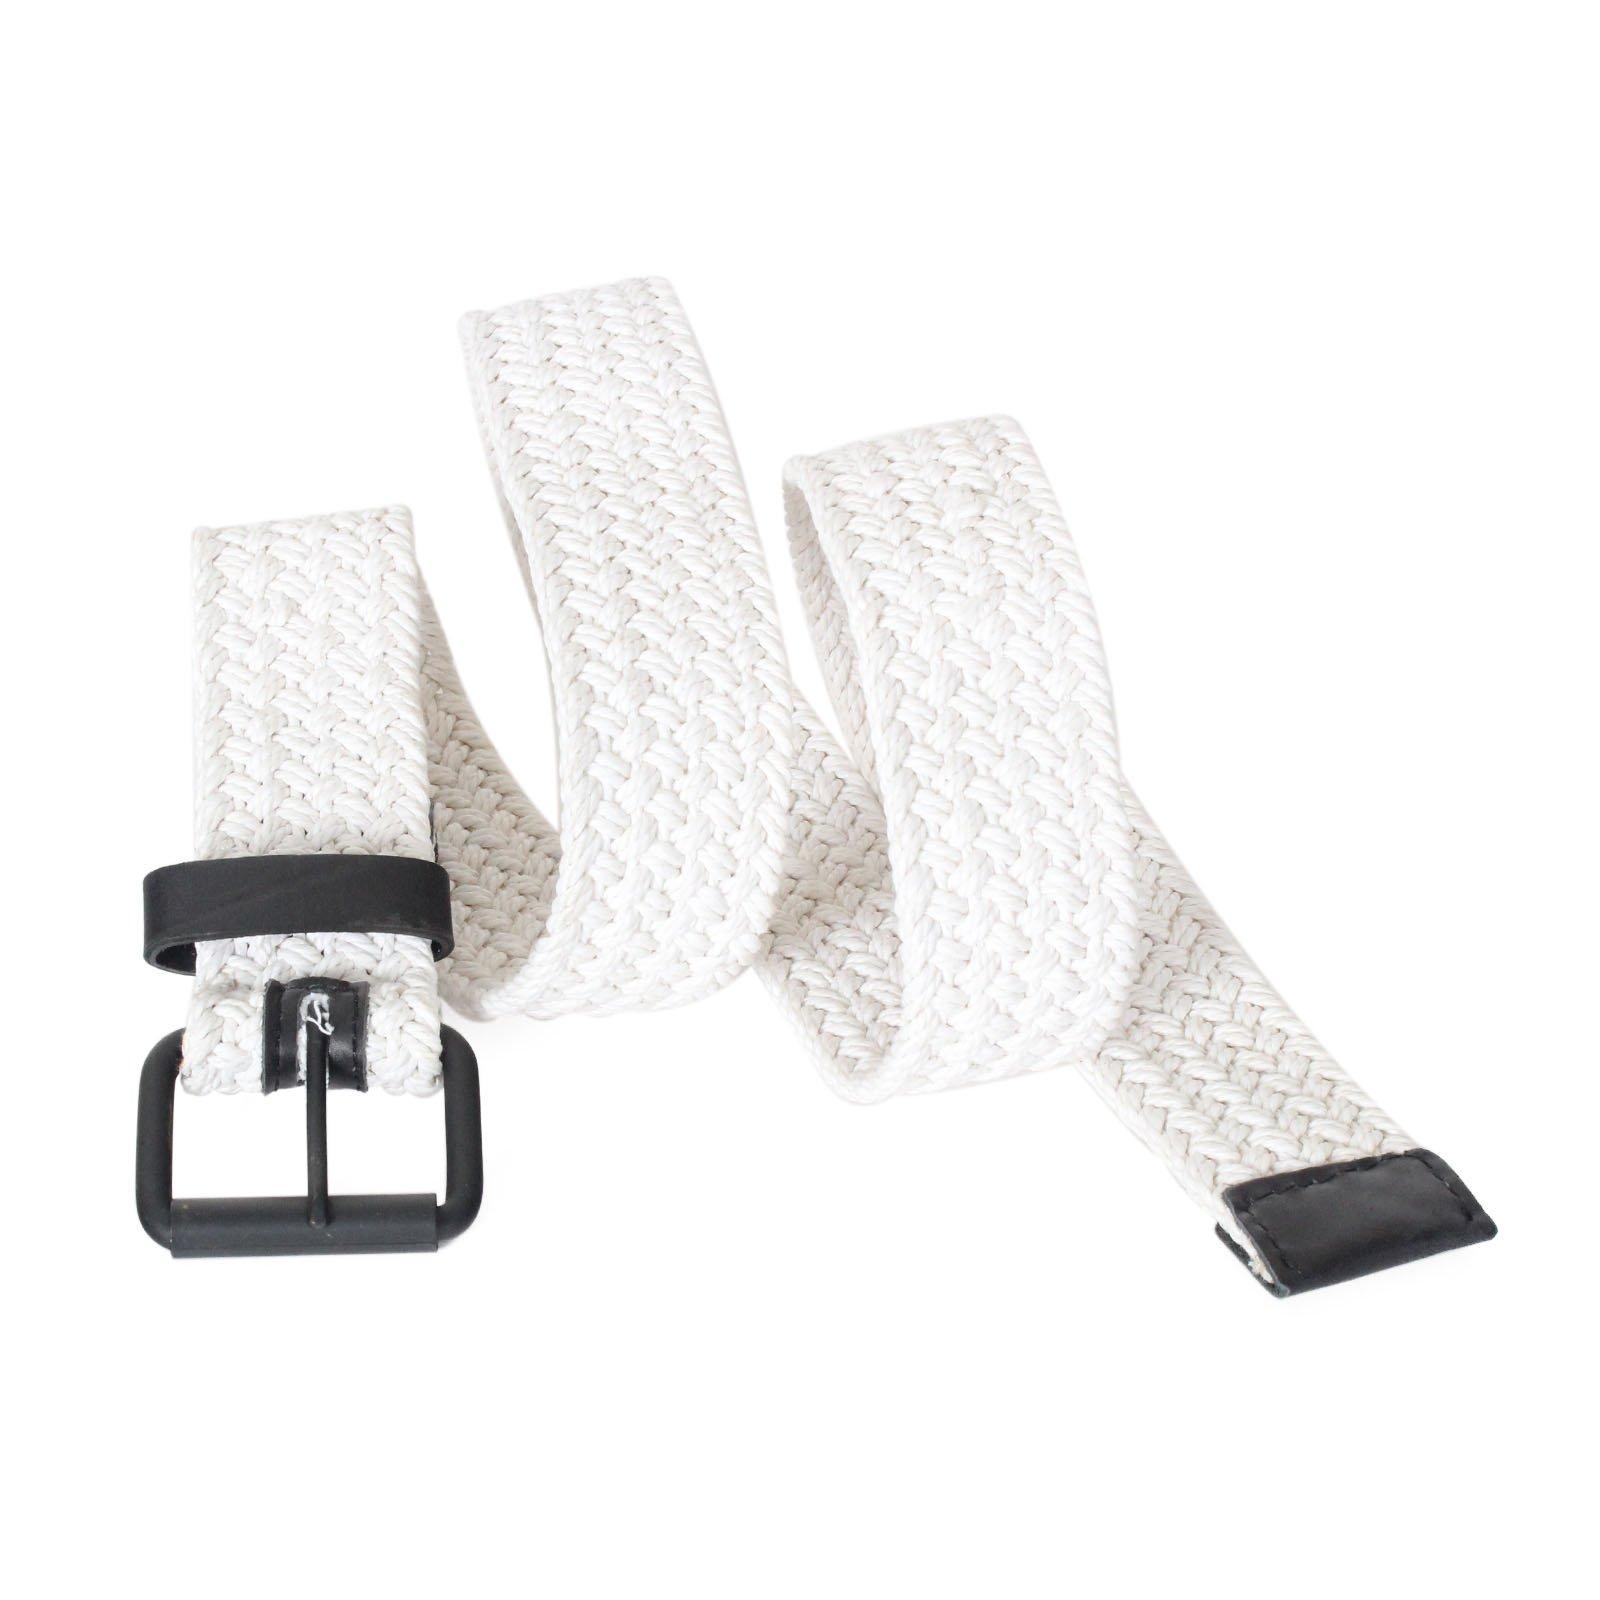 AK744 - Men's Casual Nautical Woven Braided Cotton Roller Buckle Belt (L (fits 35'' waist), White)